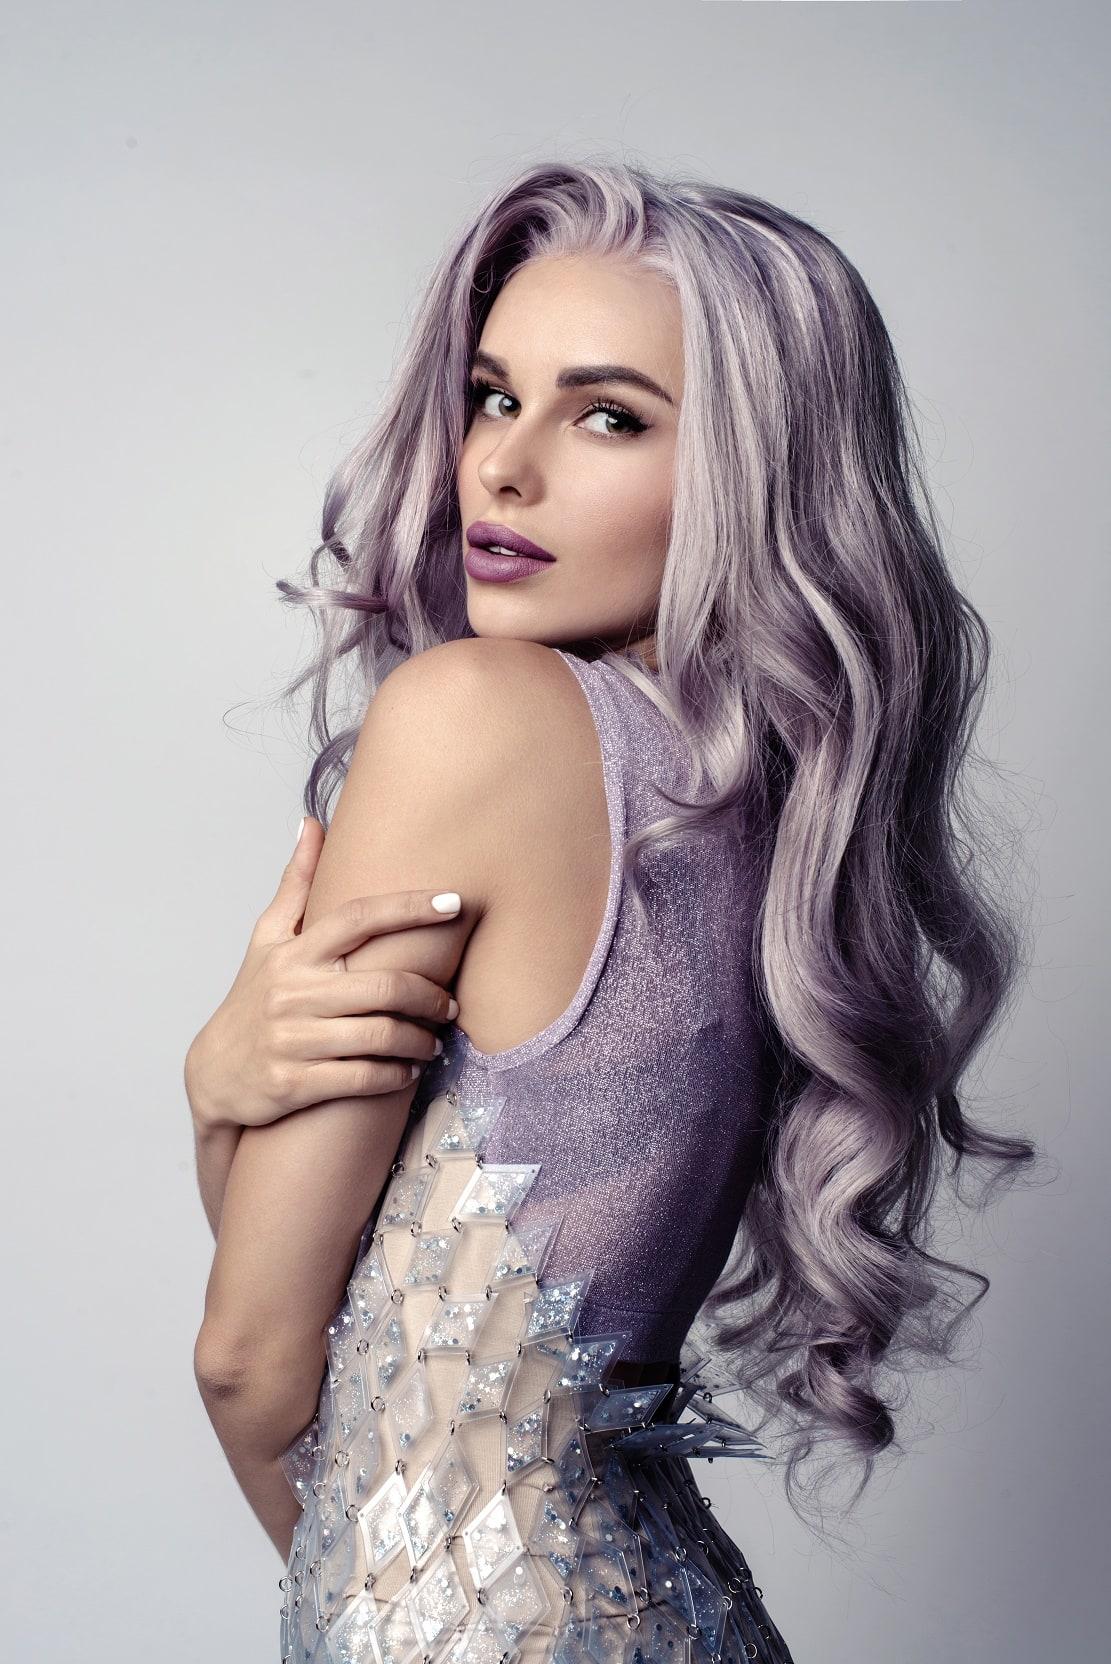 Celebrity Valeria Yakubovskaya nude (61 photos), Topless, Paparazzi, Instagram, cleavage 2020